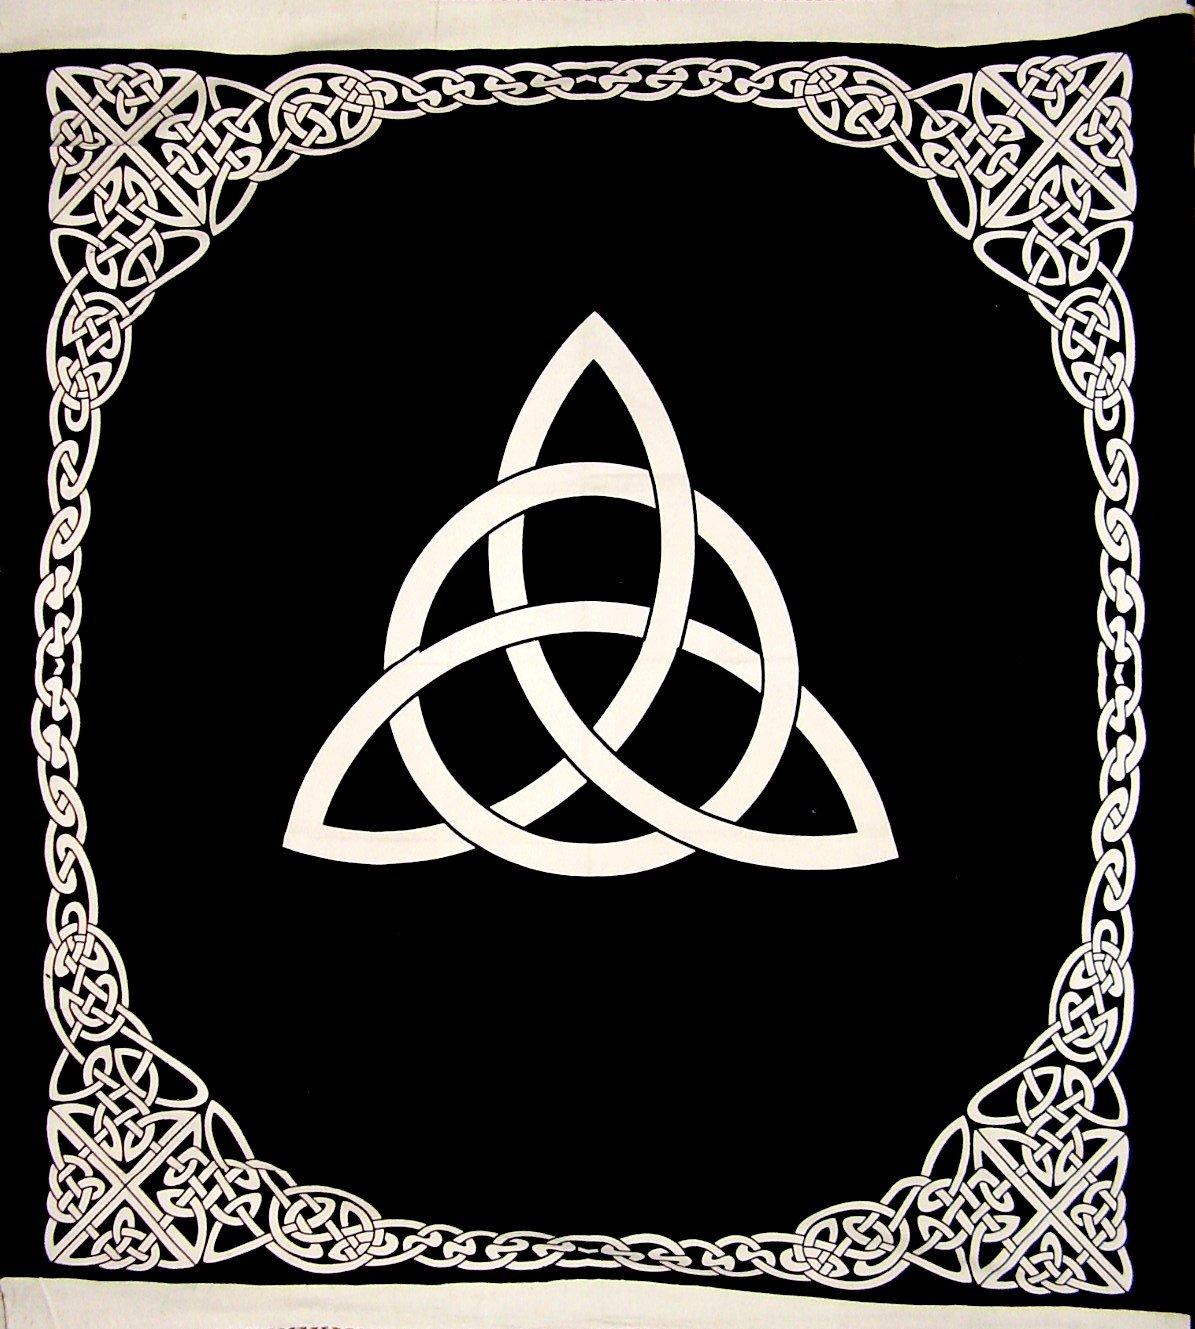 Celtic Trinity Knot Tapestry Heavy Cotton Spread 96'' x 86'' Black